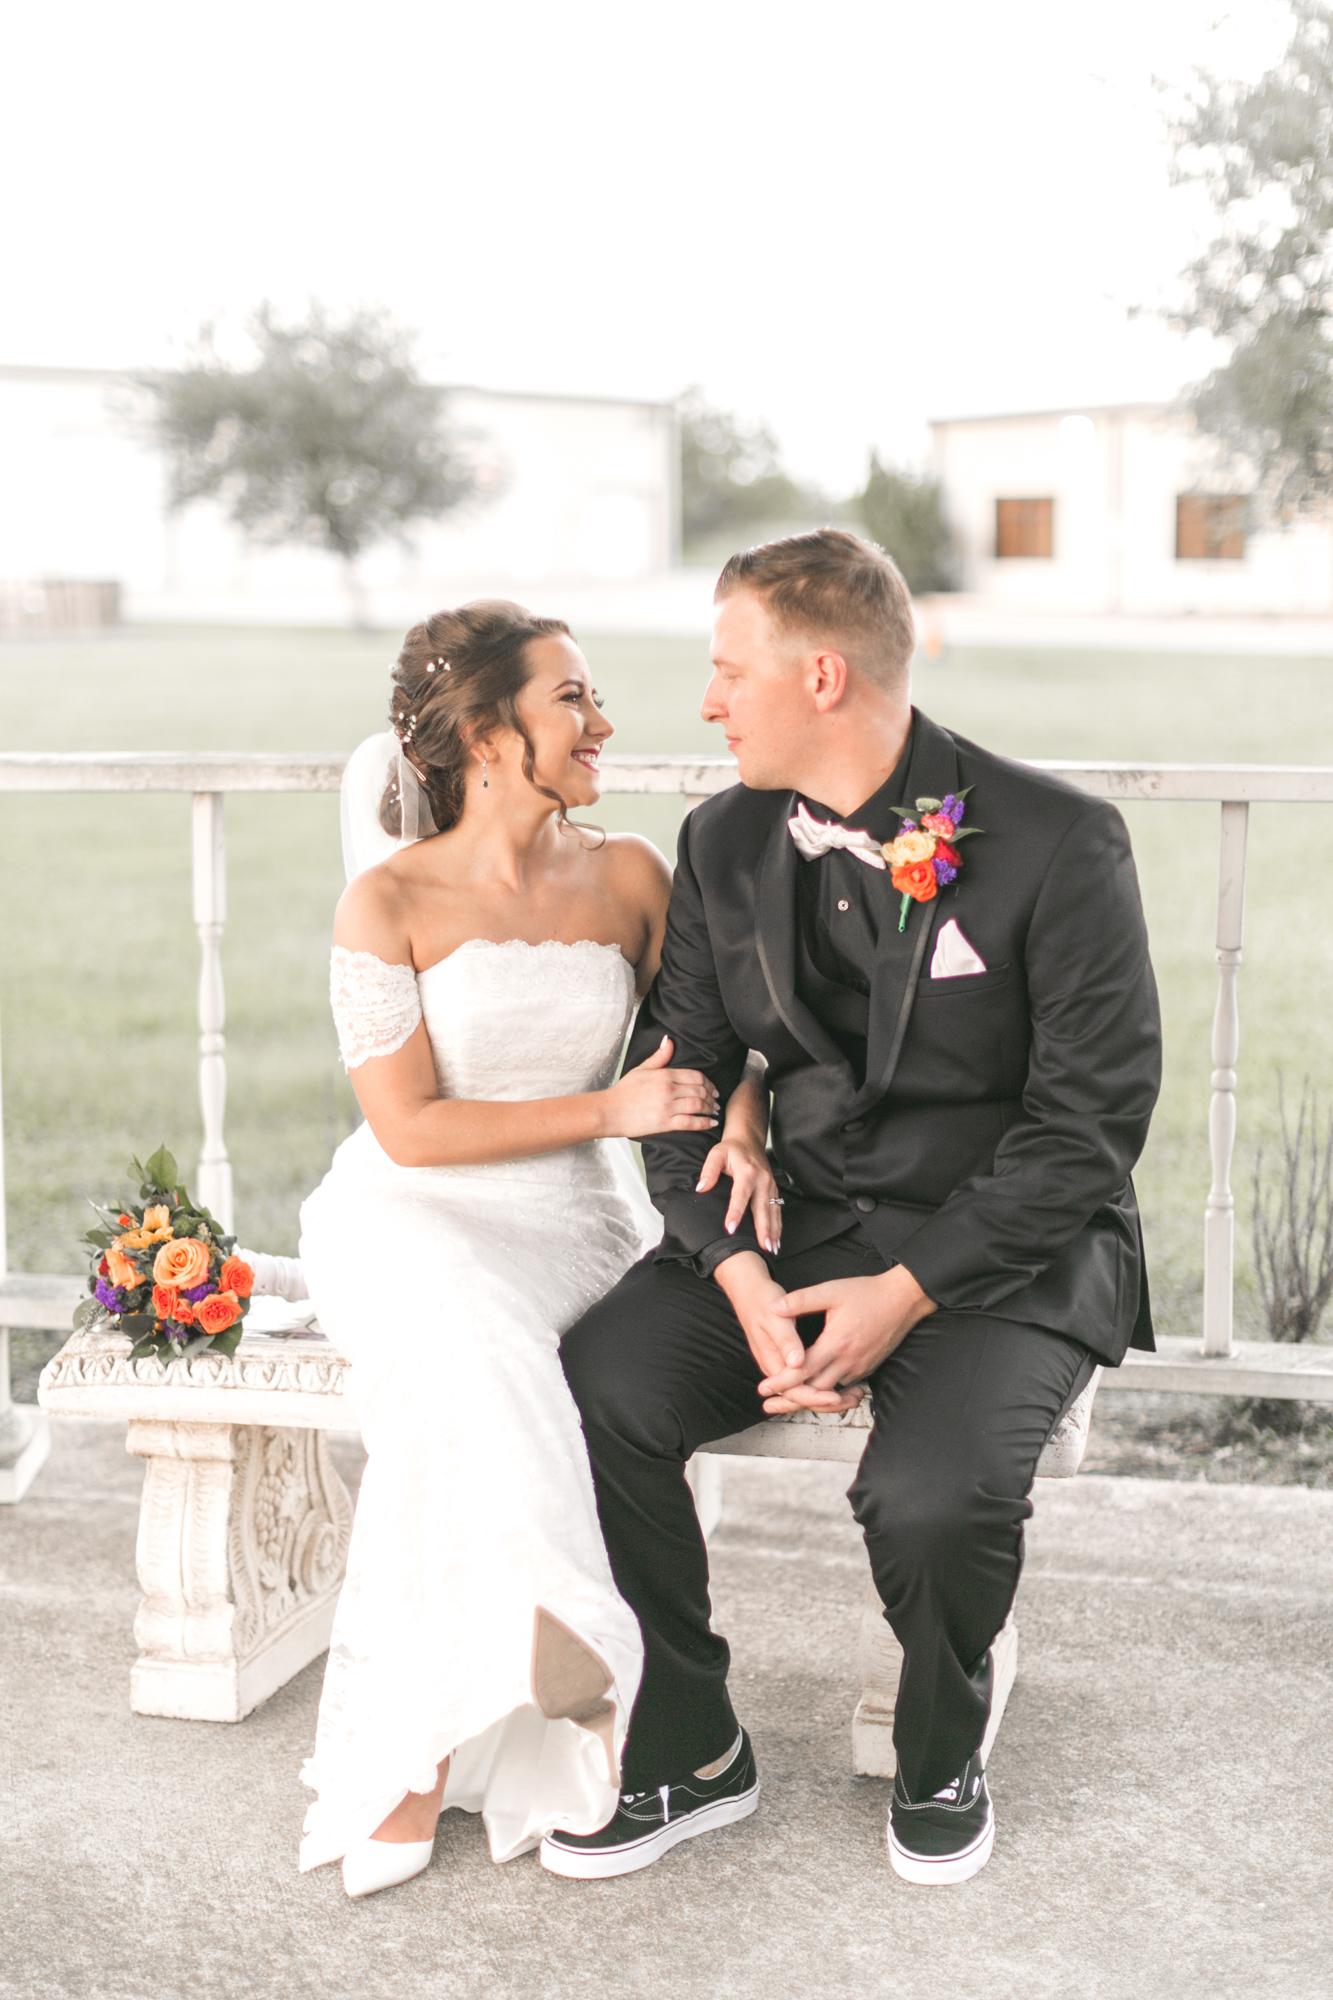 Seymour-Matte Wedding-3.jpg